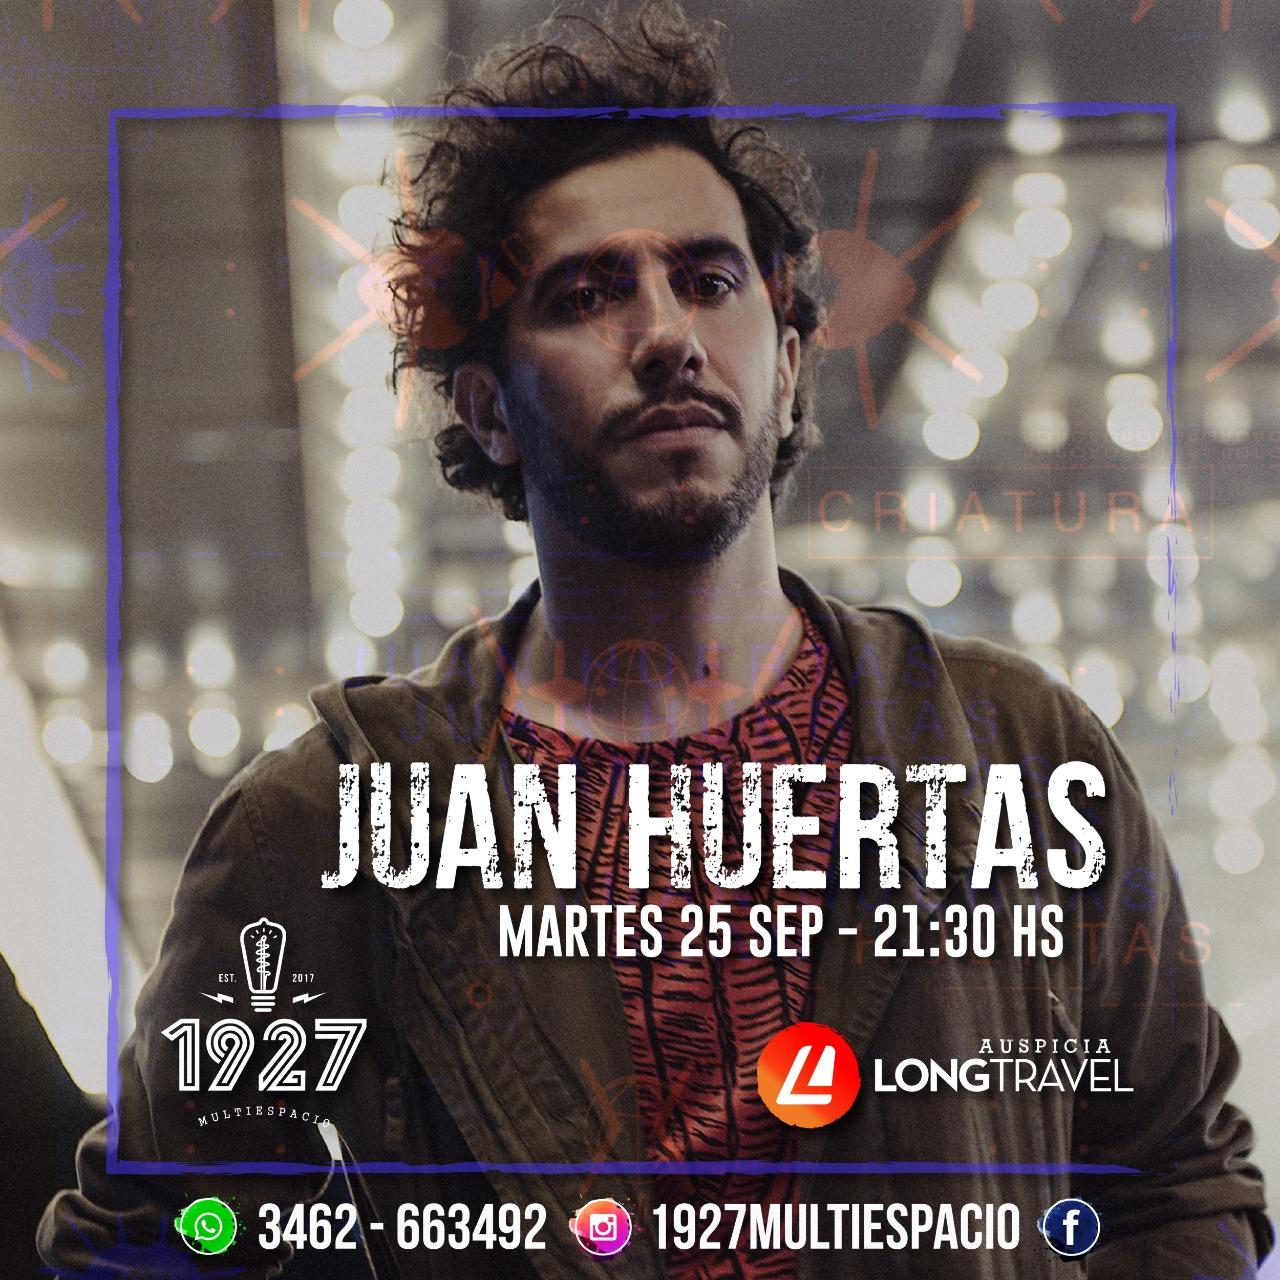 https://www.venado24.com.ar/archivos24/uploads/2018/09/Flyer-HUERTAS-en-Venado-Tuerto.jpeg